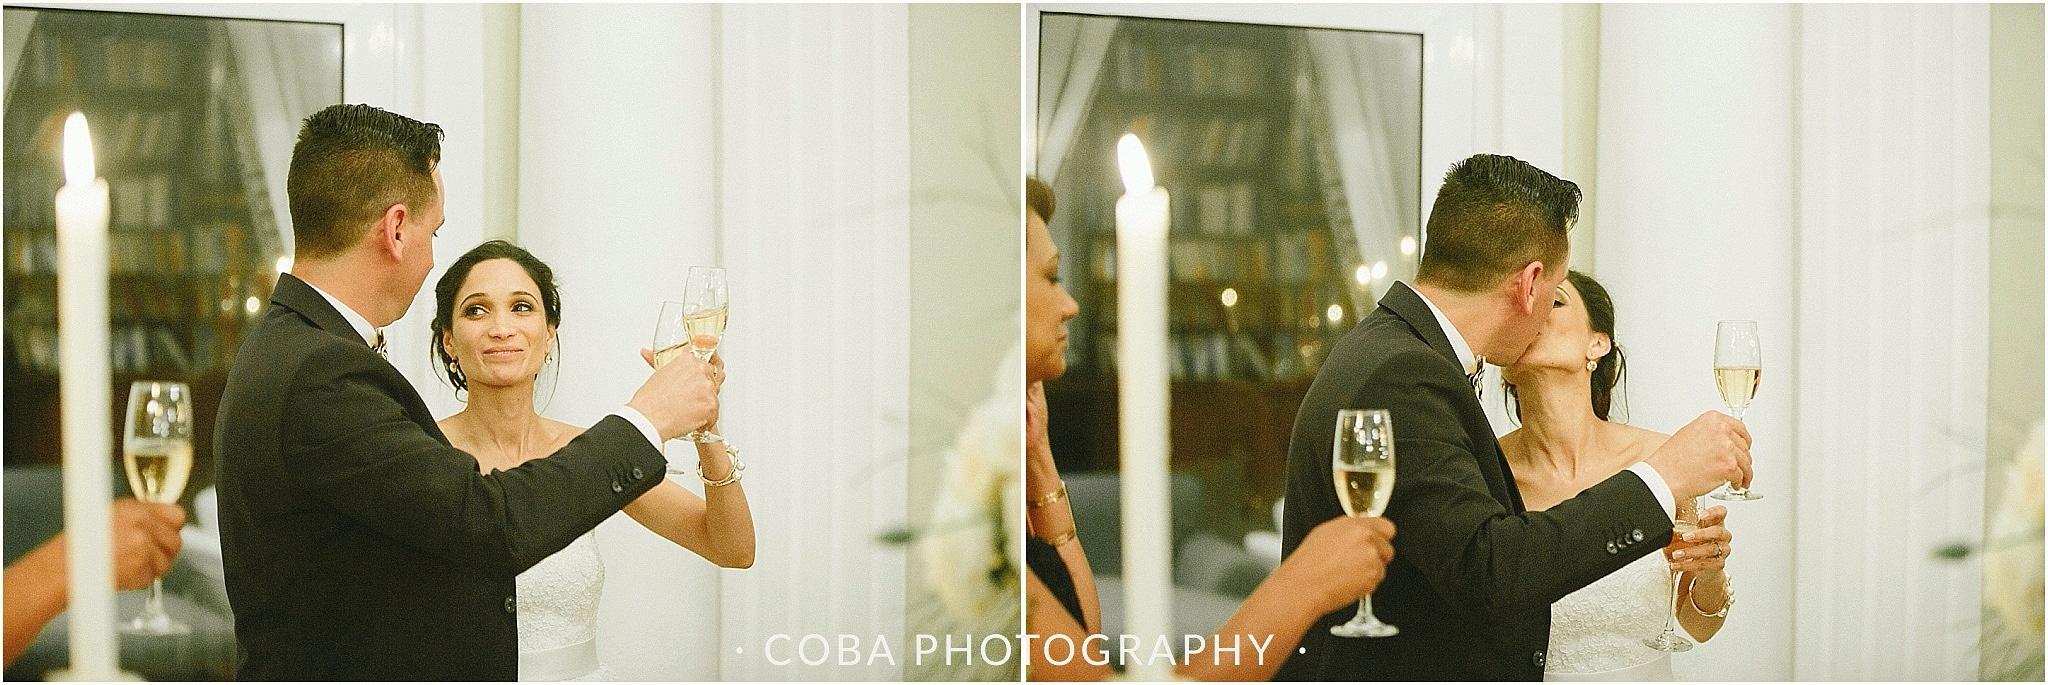 Marc&Melissa - Cascade Manor - Coba Photography (16)